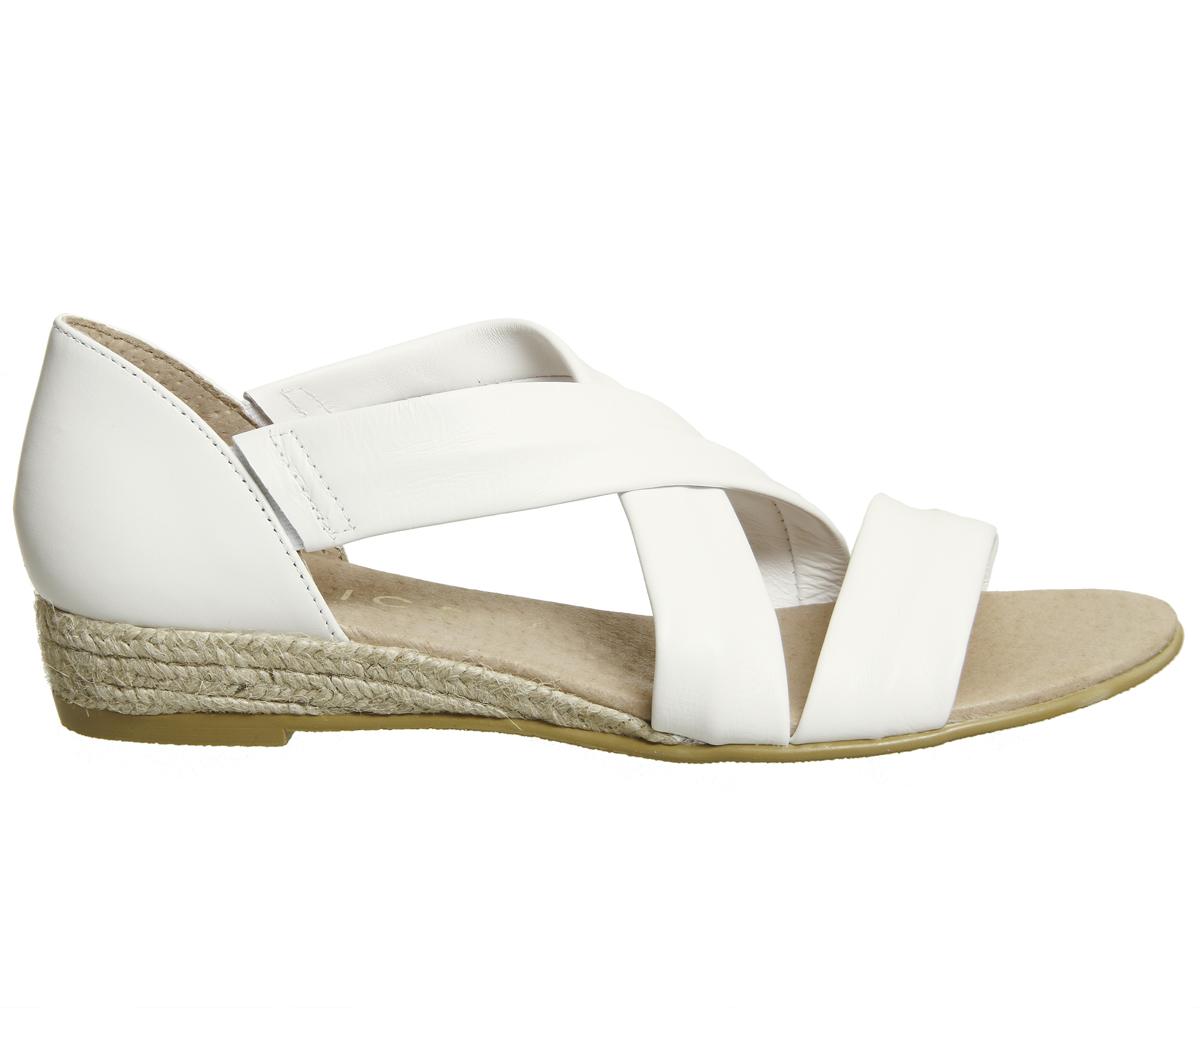 Último gran descuento Womens Office Hallie Cross Strap Espadrilles WHITE LEATHER Sandals